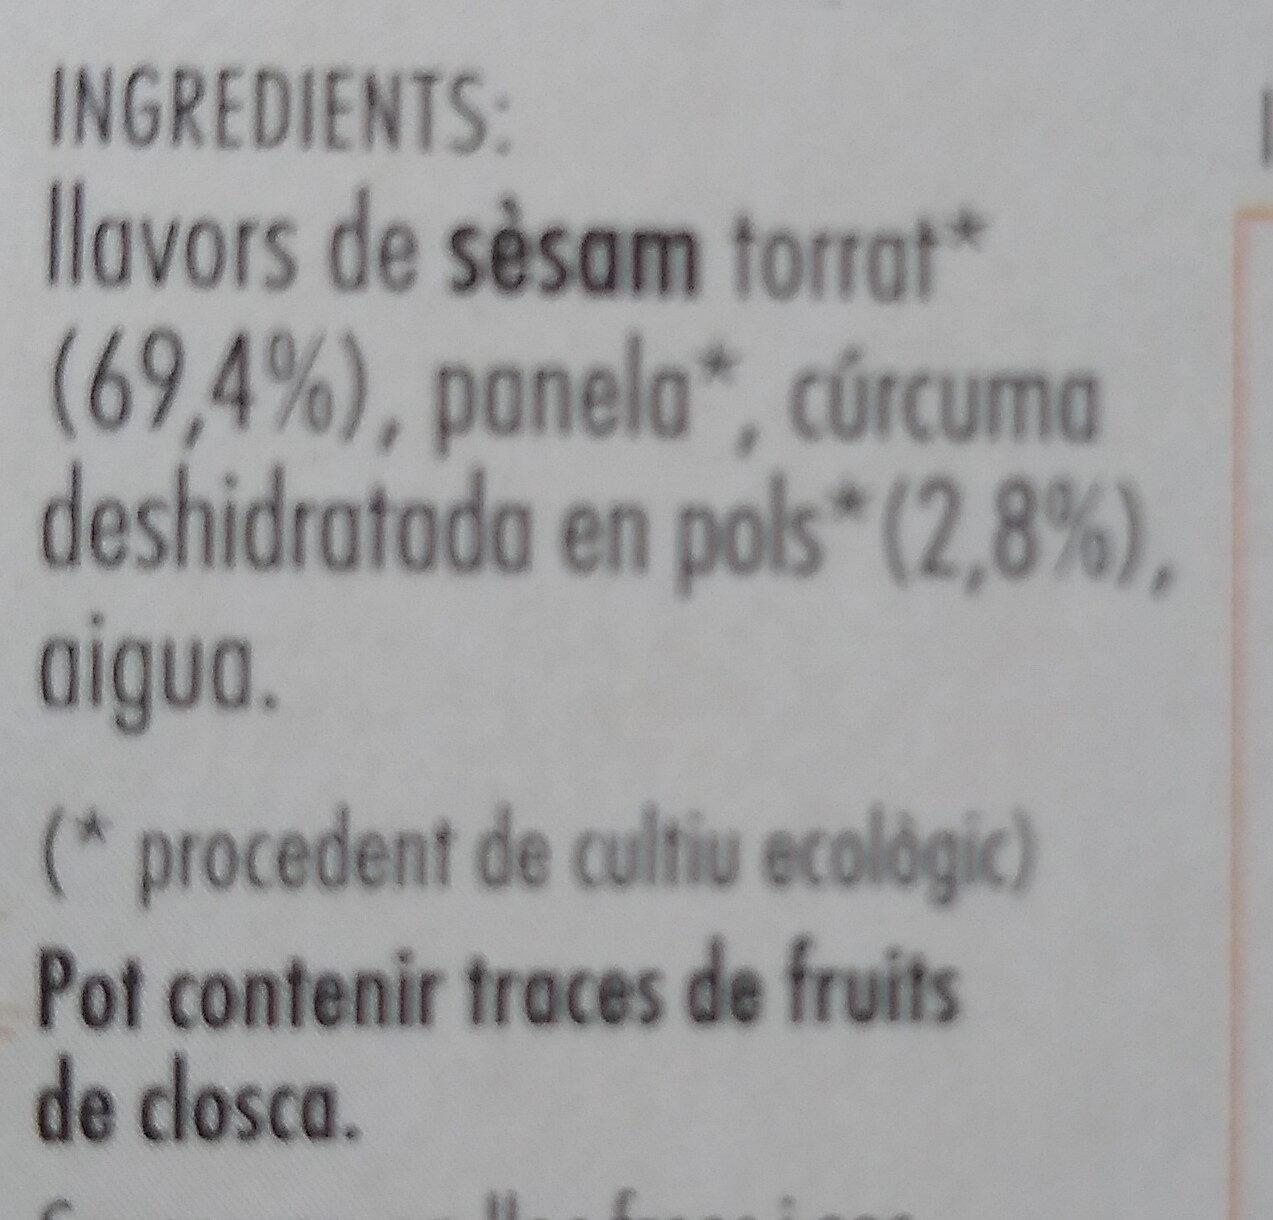 Sèsam caramel·litzat amb Cúrcuma - Ingredientes - ca